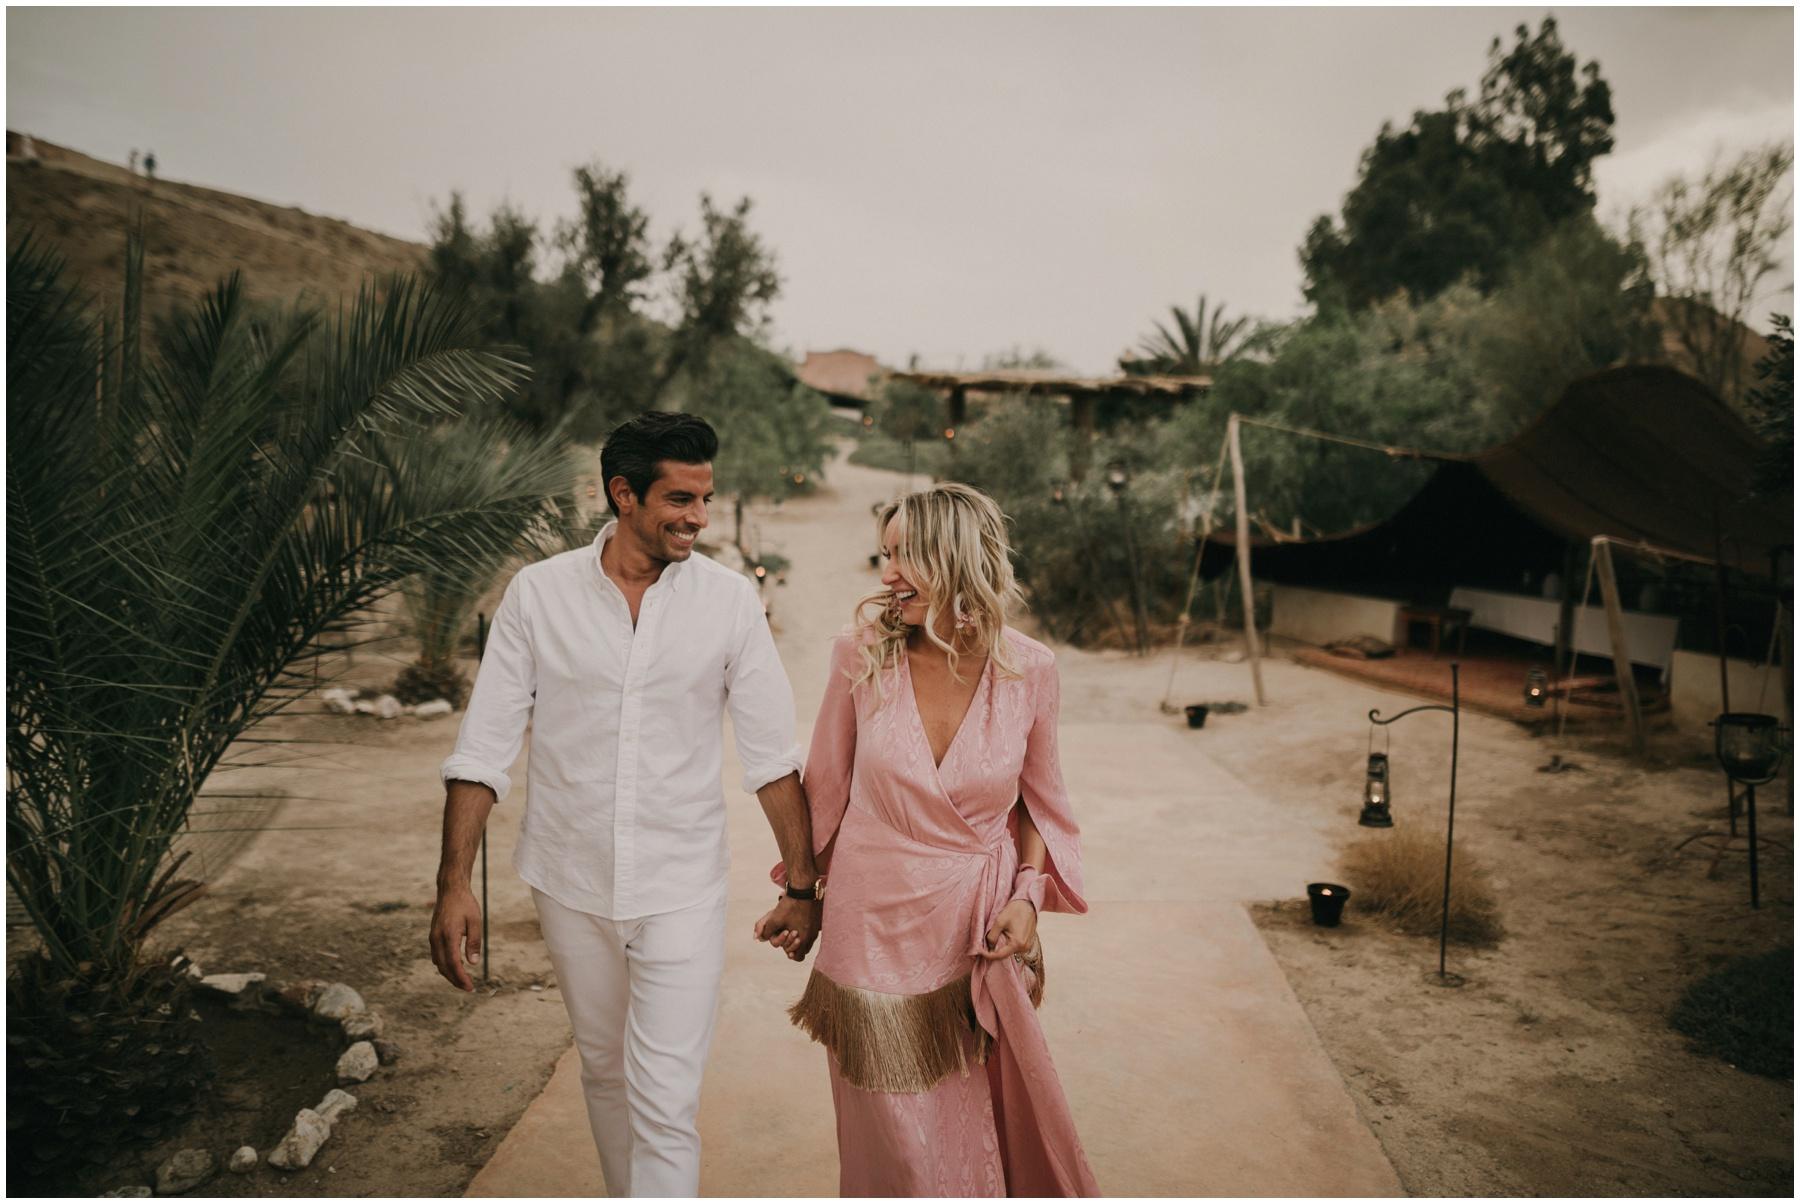 Marrakech Wedding La Pause 019.JPG